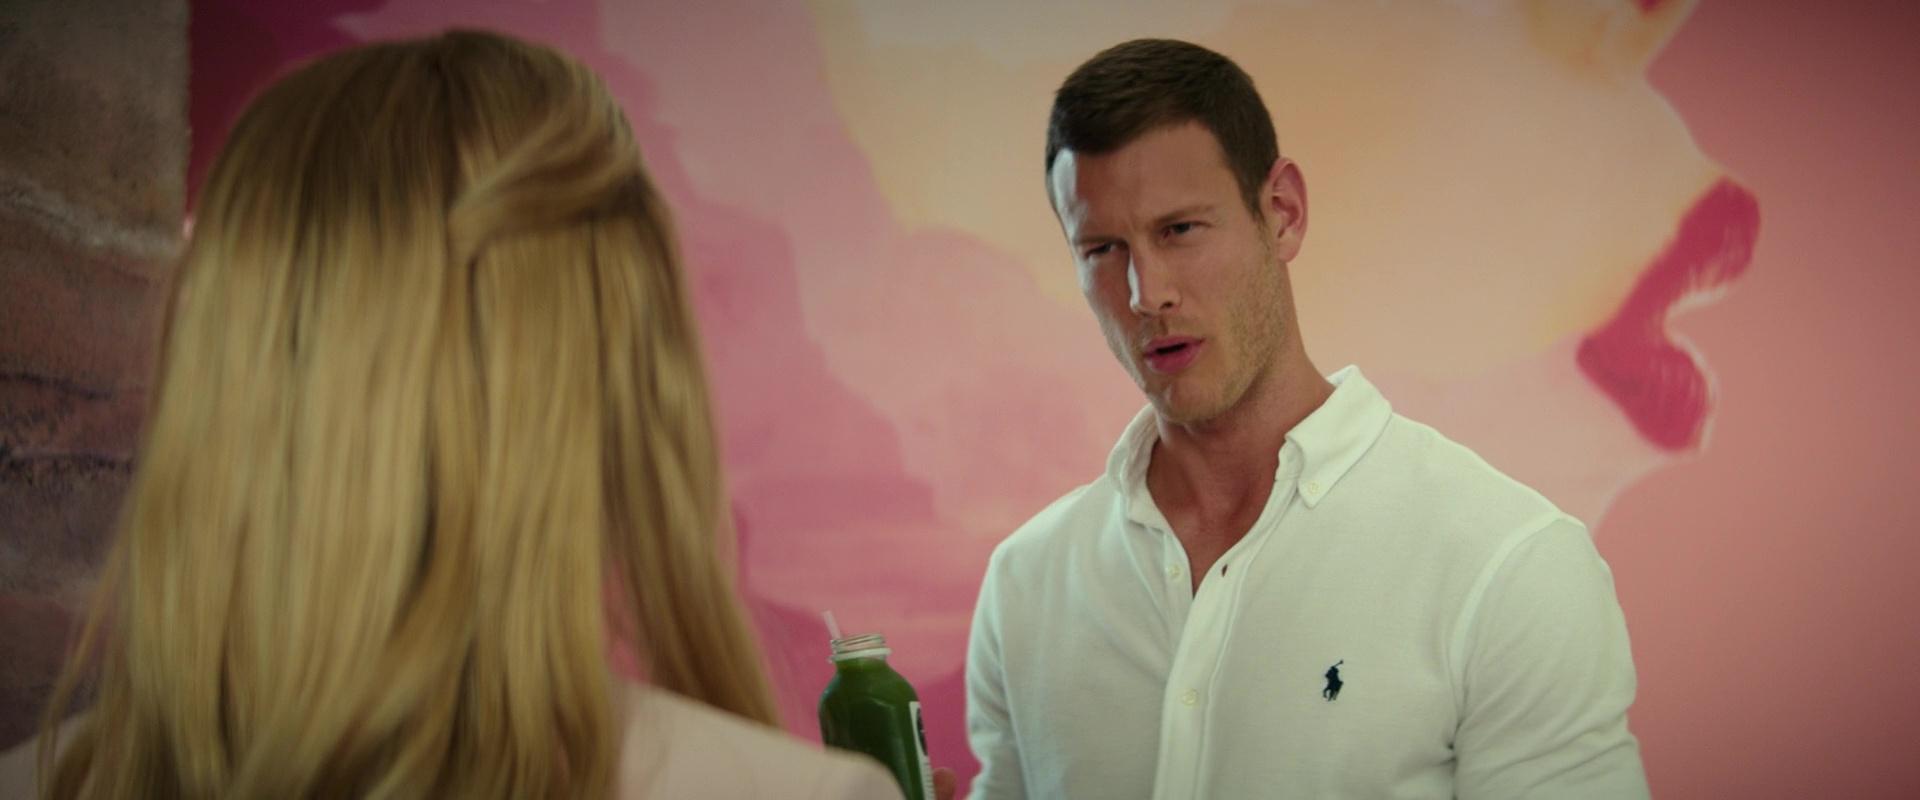 3dee24db23 Ralph Lauren White Shirt Worn by Tom Hopper in I Feel Pretty (2018) Movie